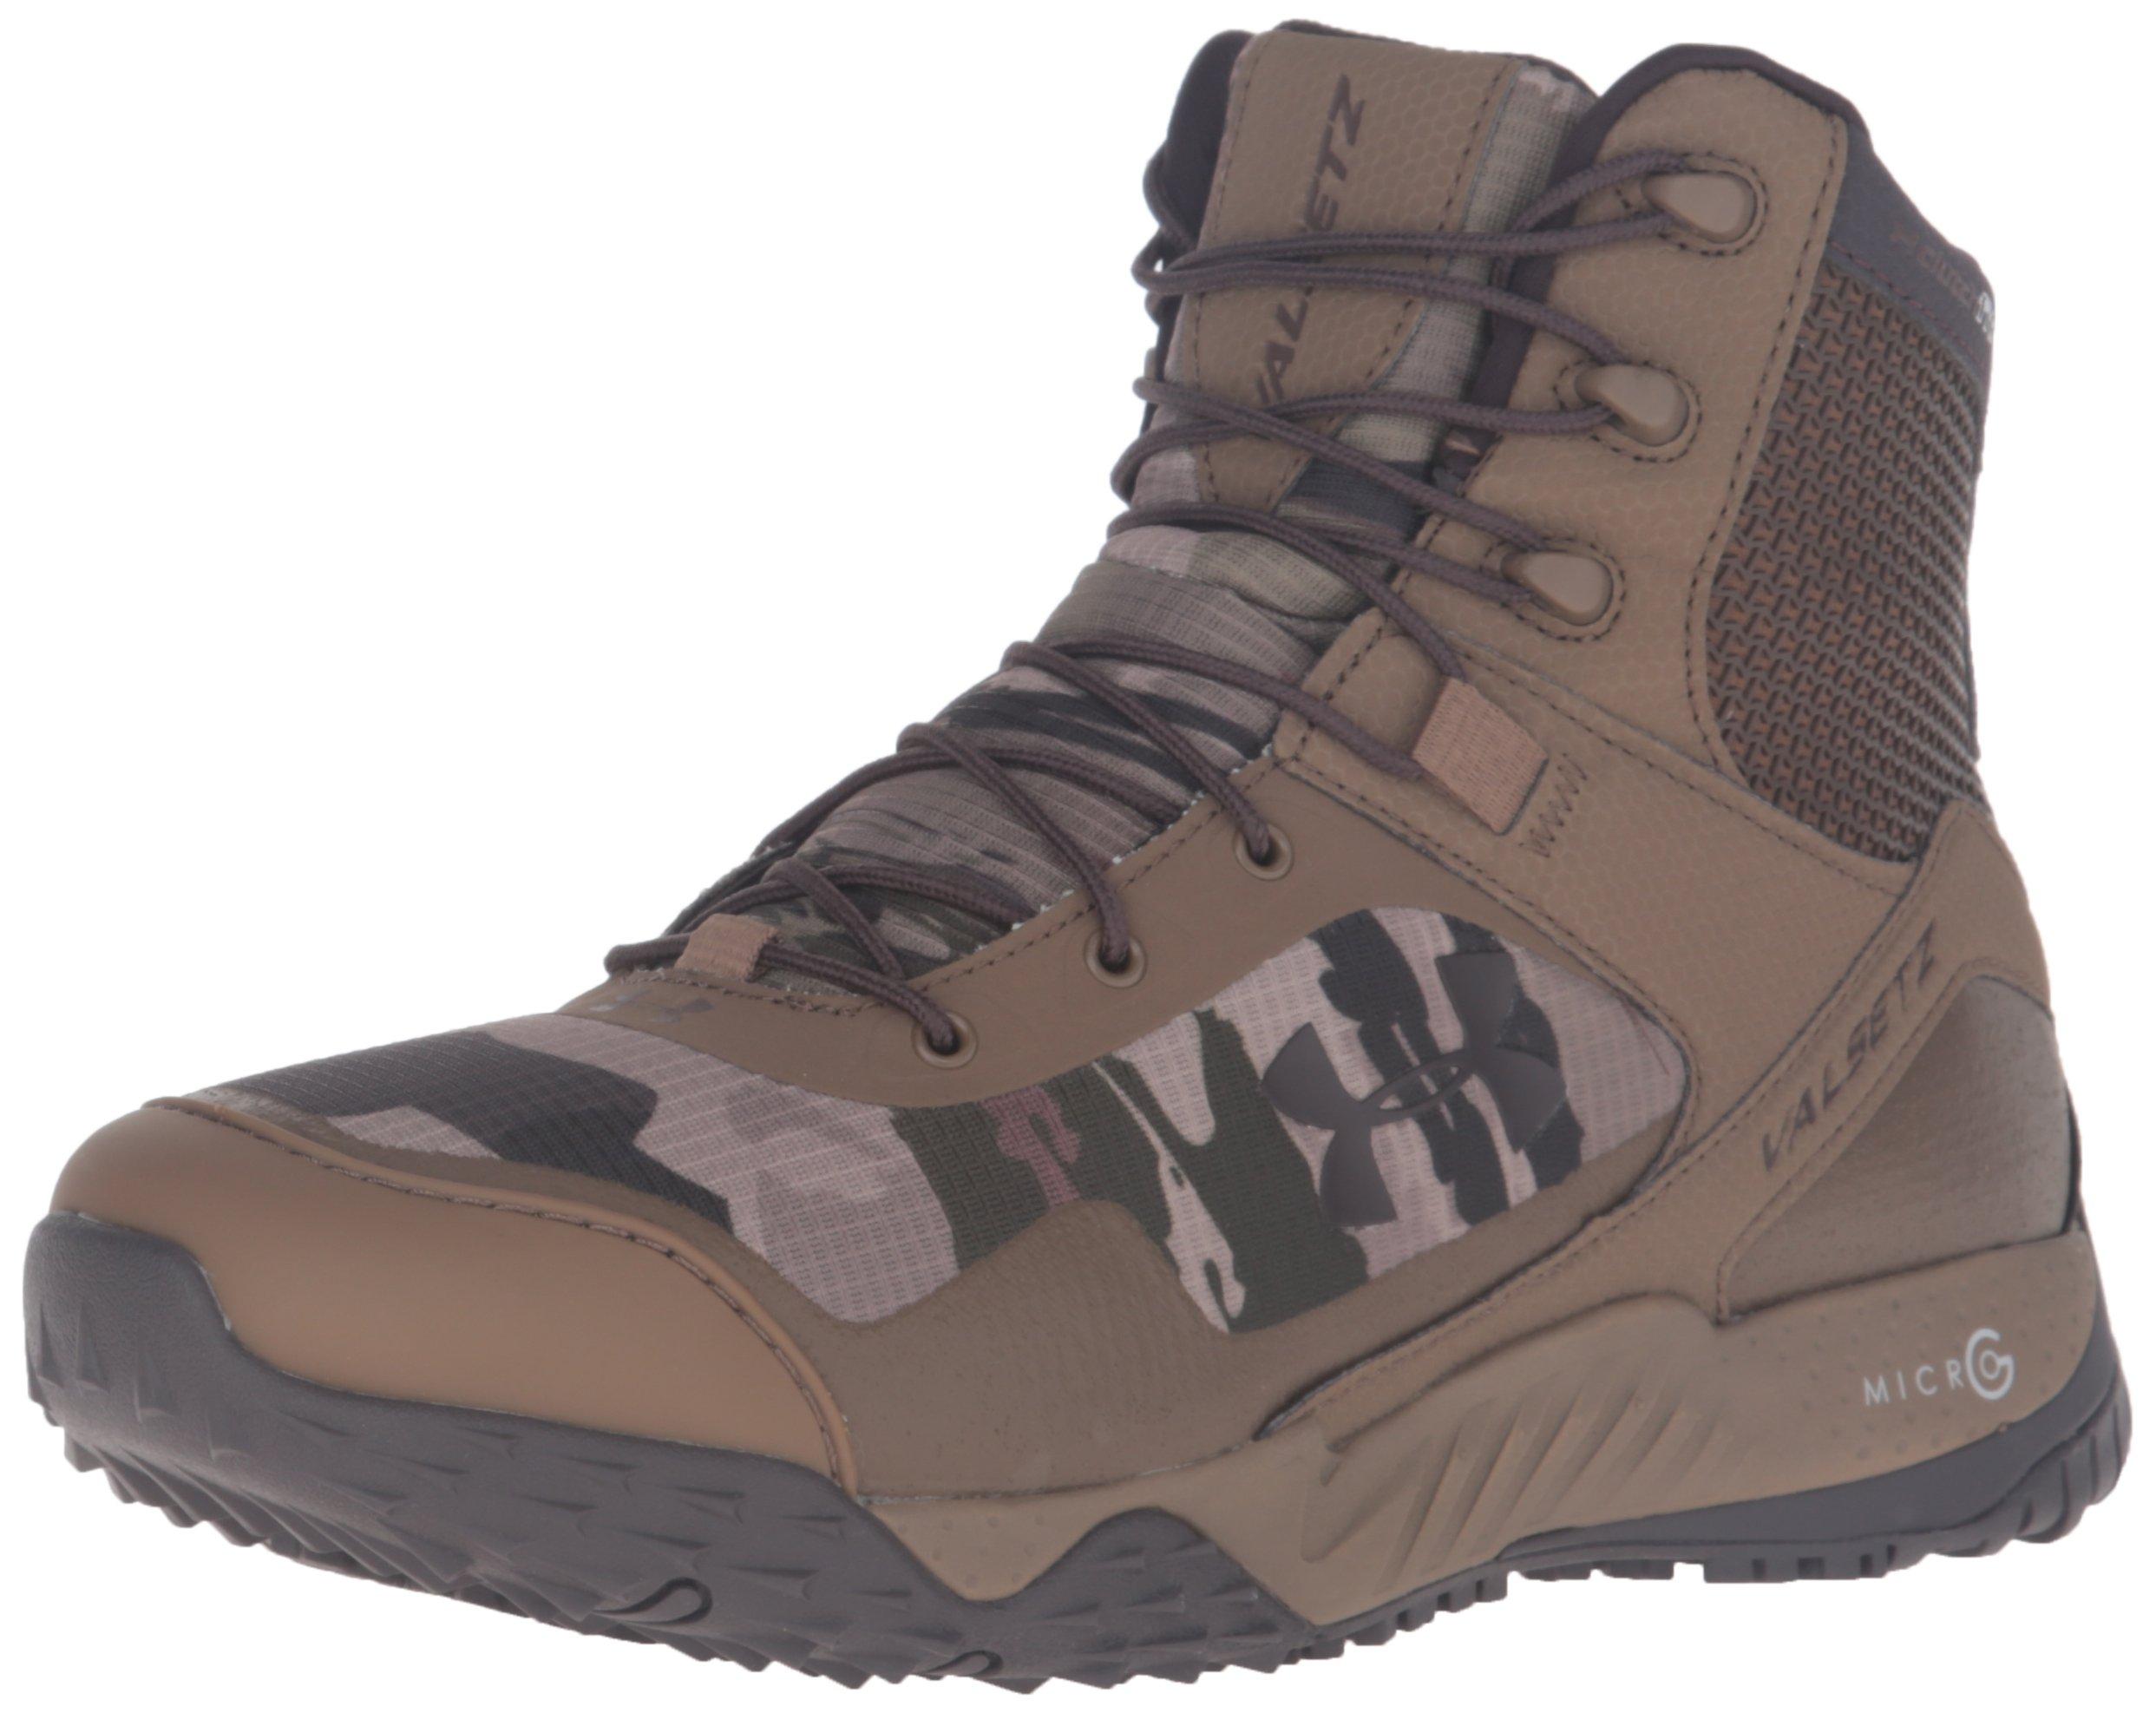 e18d240216c Cheap Under Armour Valsetz, find Under Armour Valsetz deals on line ...